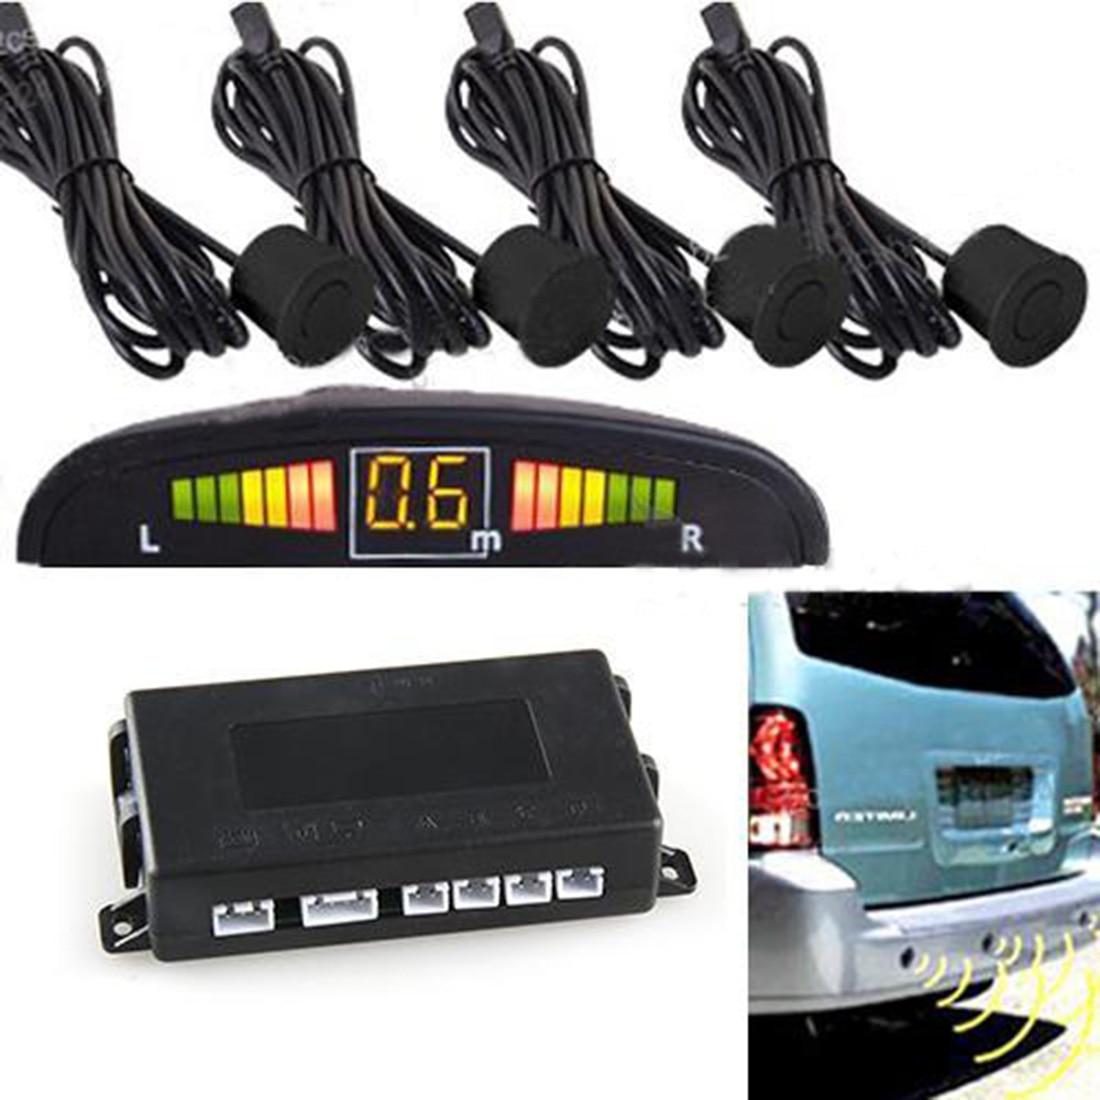 Car LED Parking Sensor With 4 Sensors DE Estacionamento Assist Reverse Backup Radar Monitor System Backlight Display Parktronic